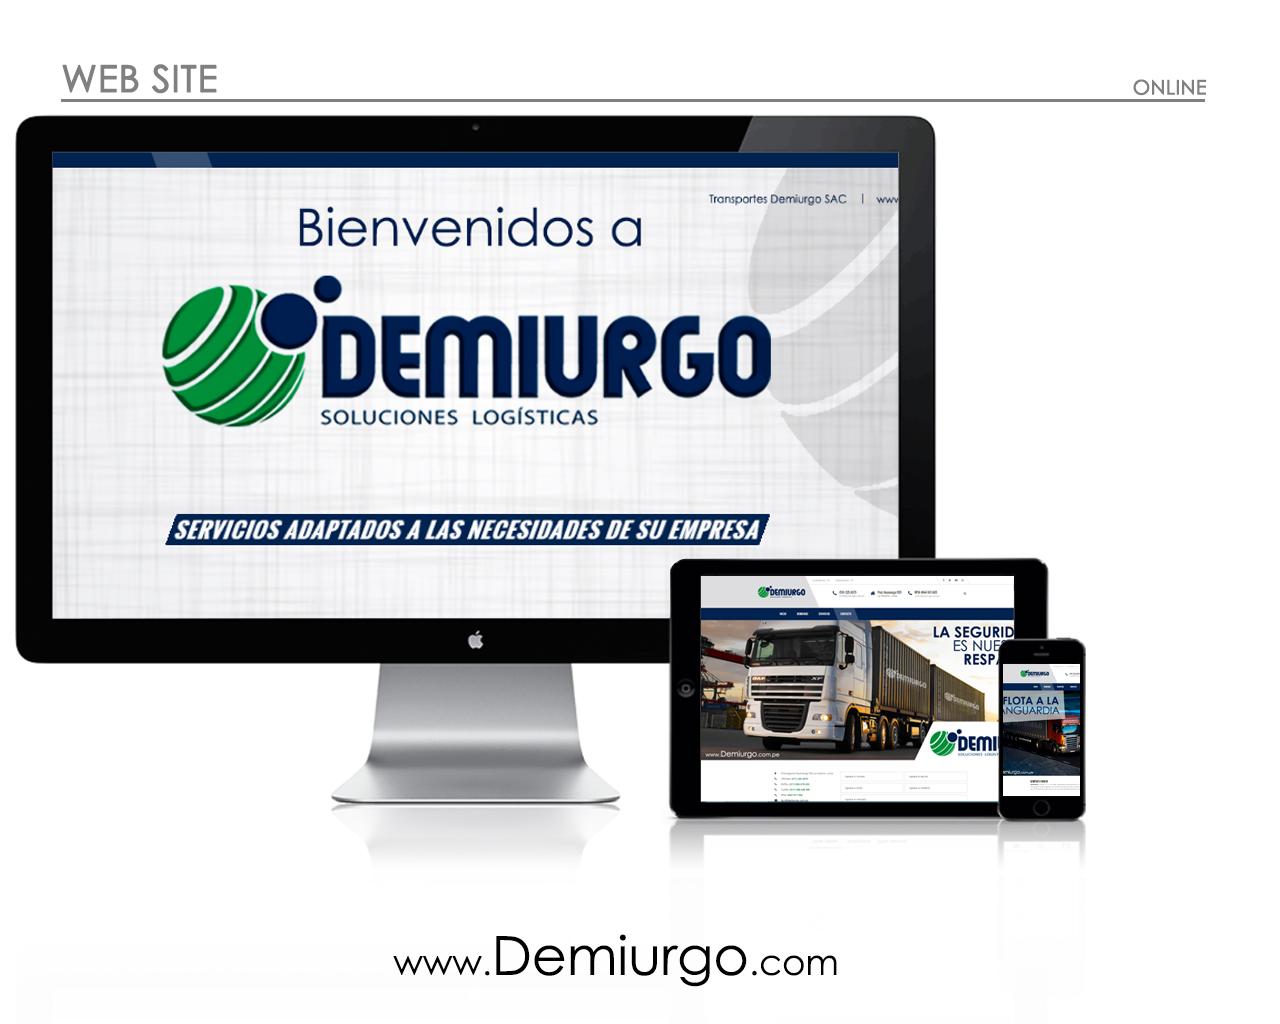 demiurgo_web